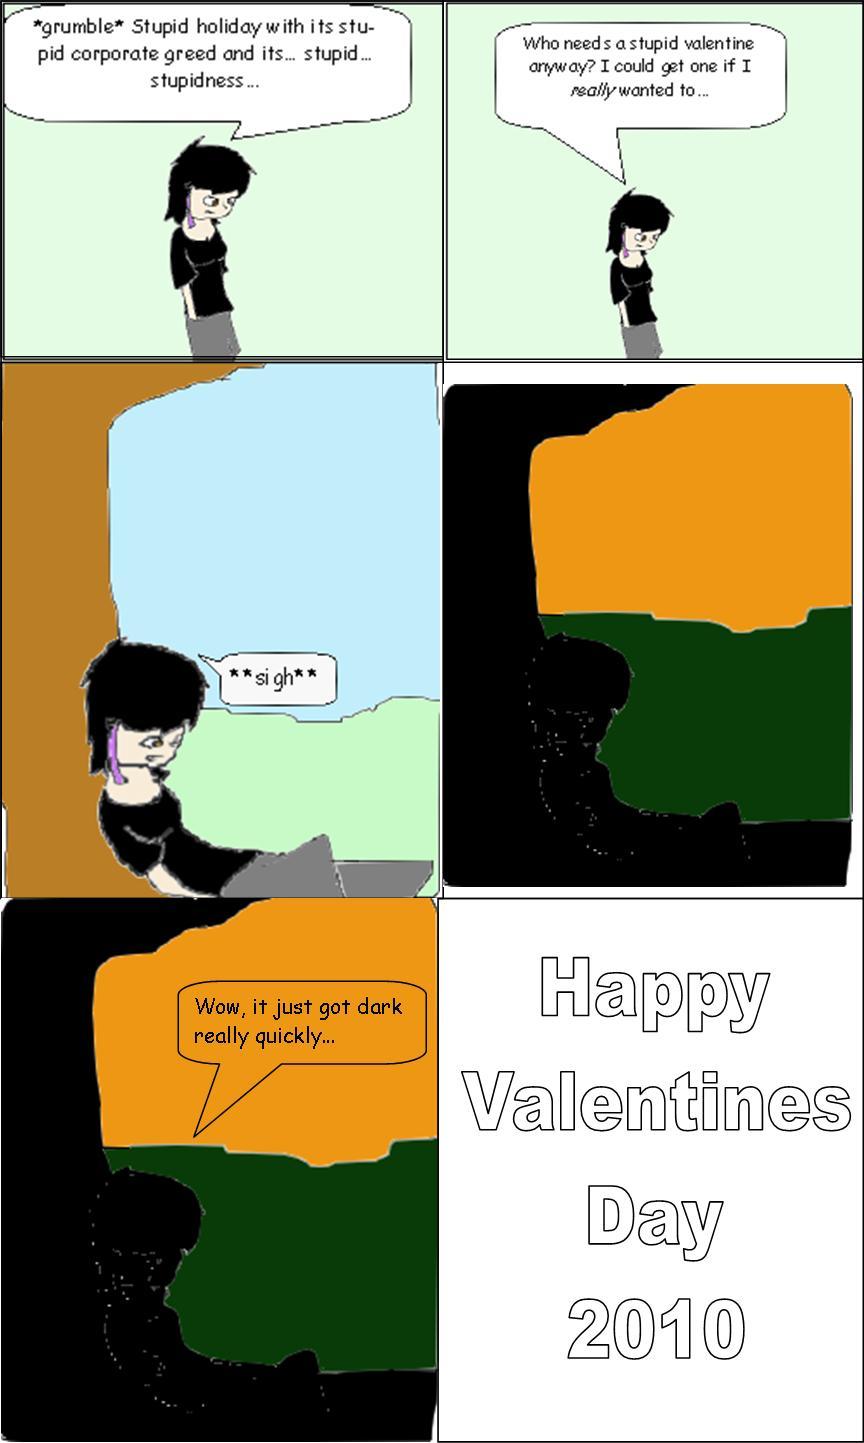 41: Valentines day